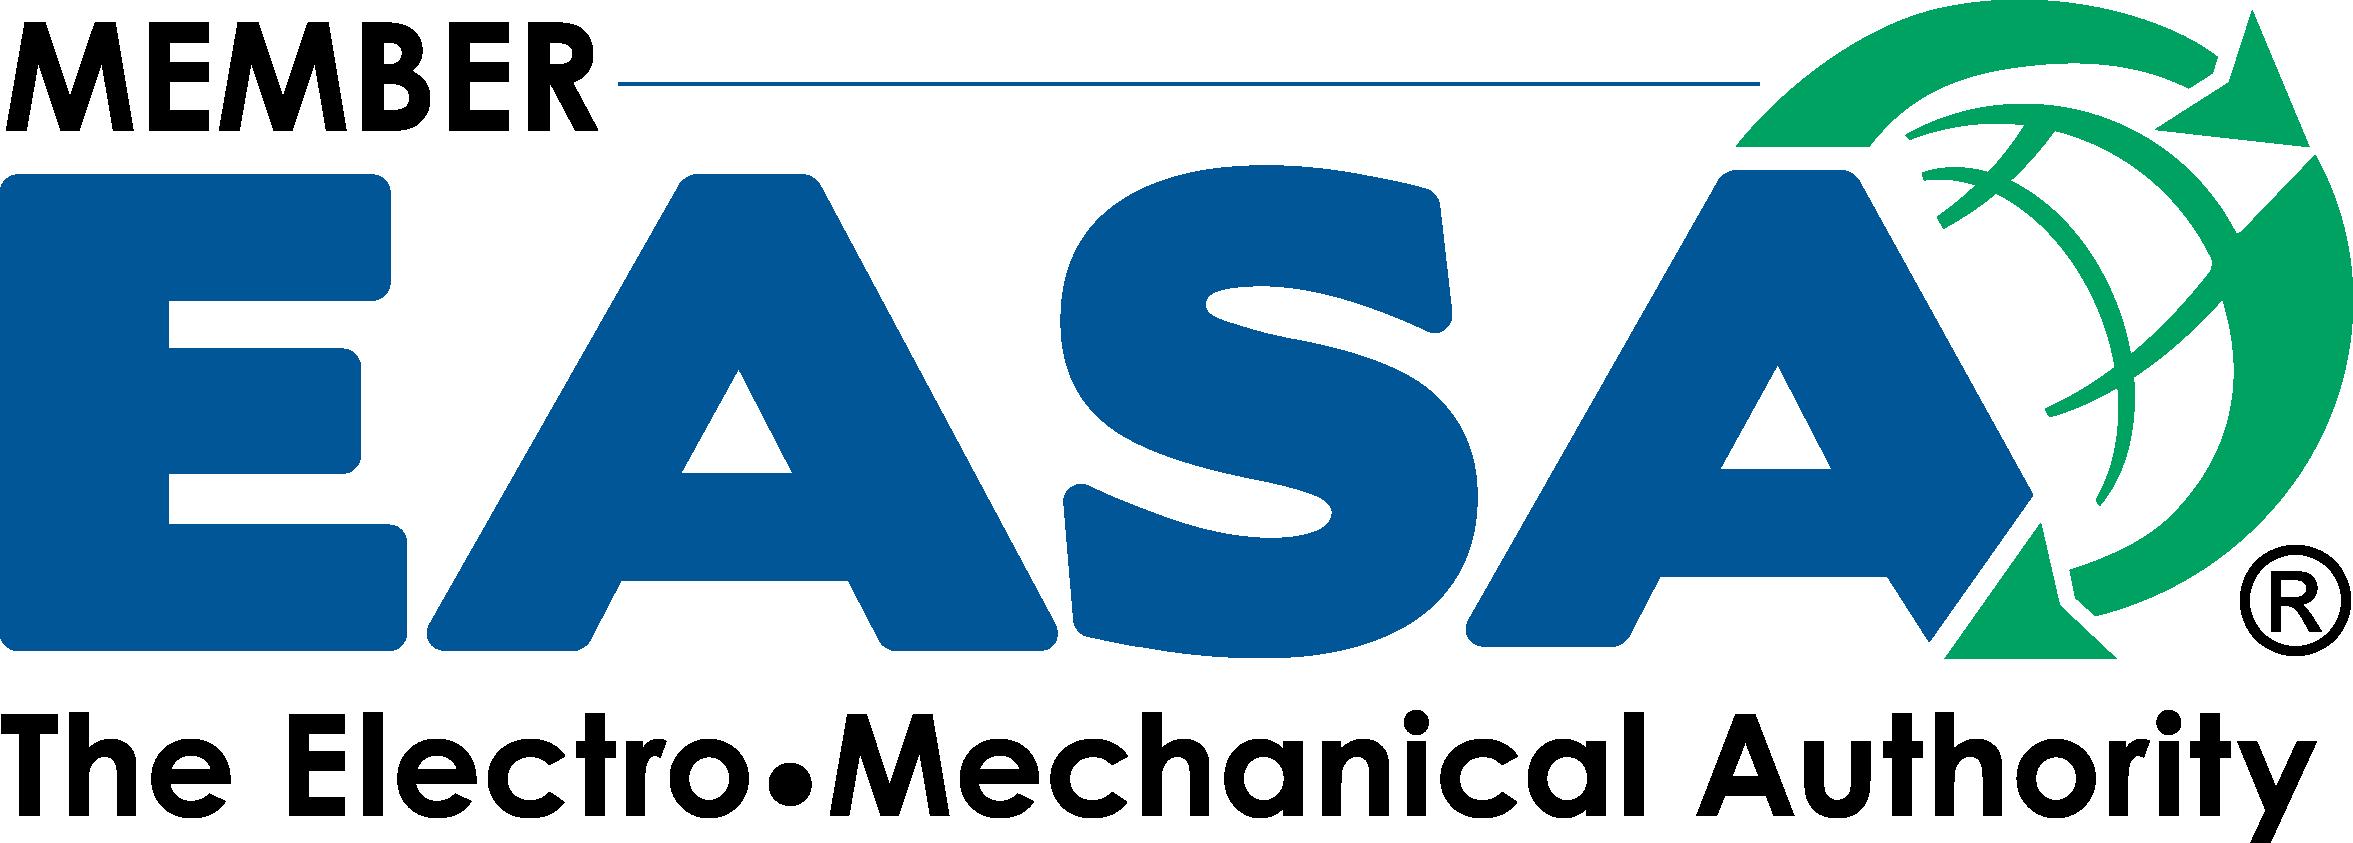 Electrical-apparatus-service-association